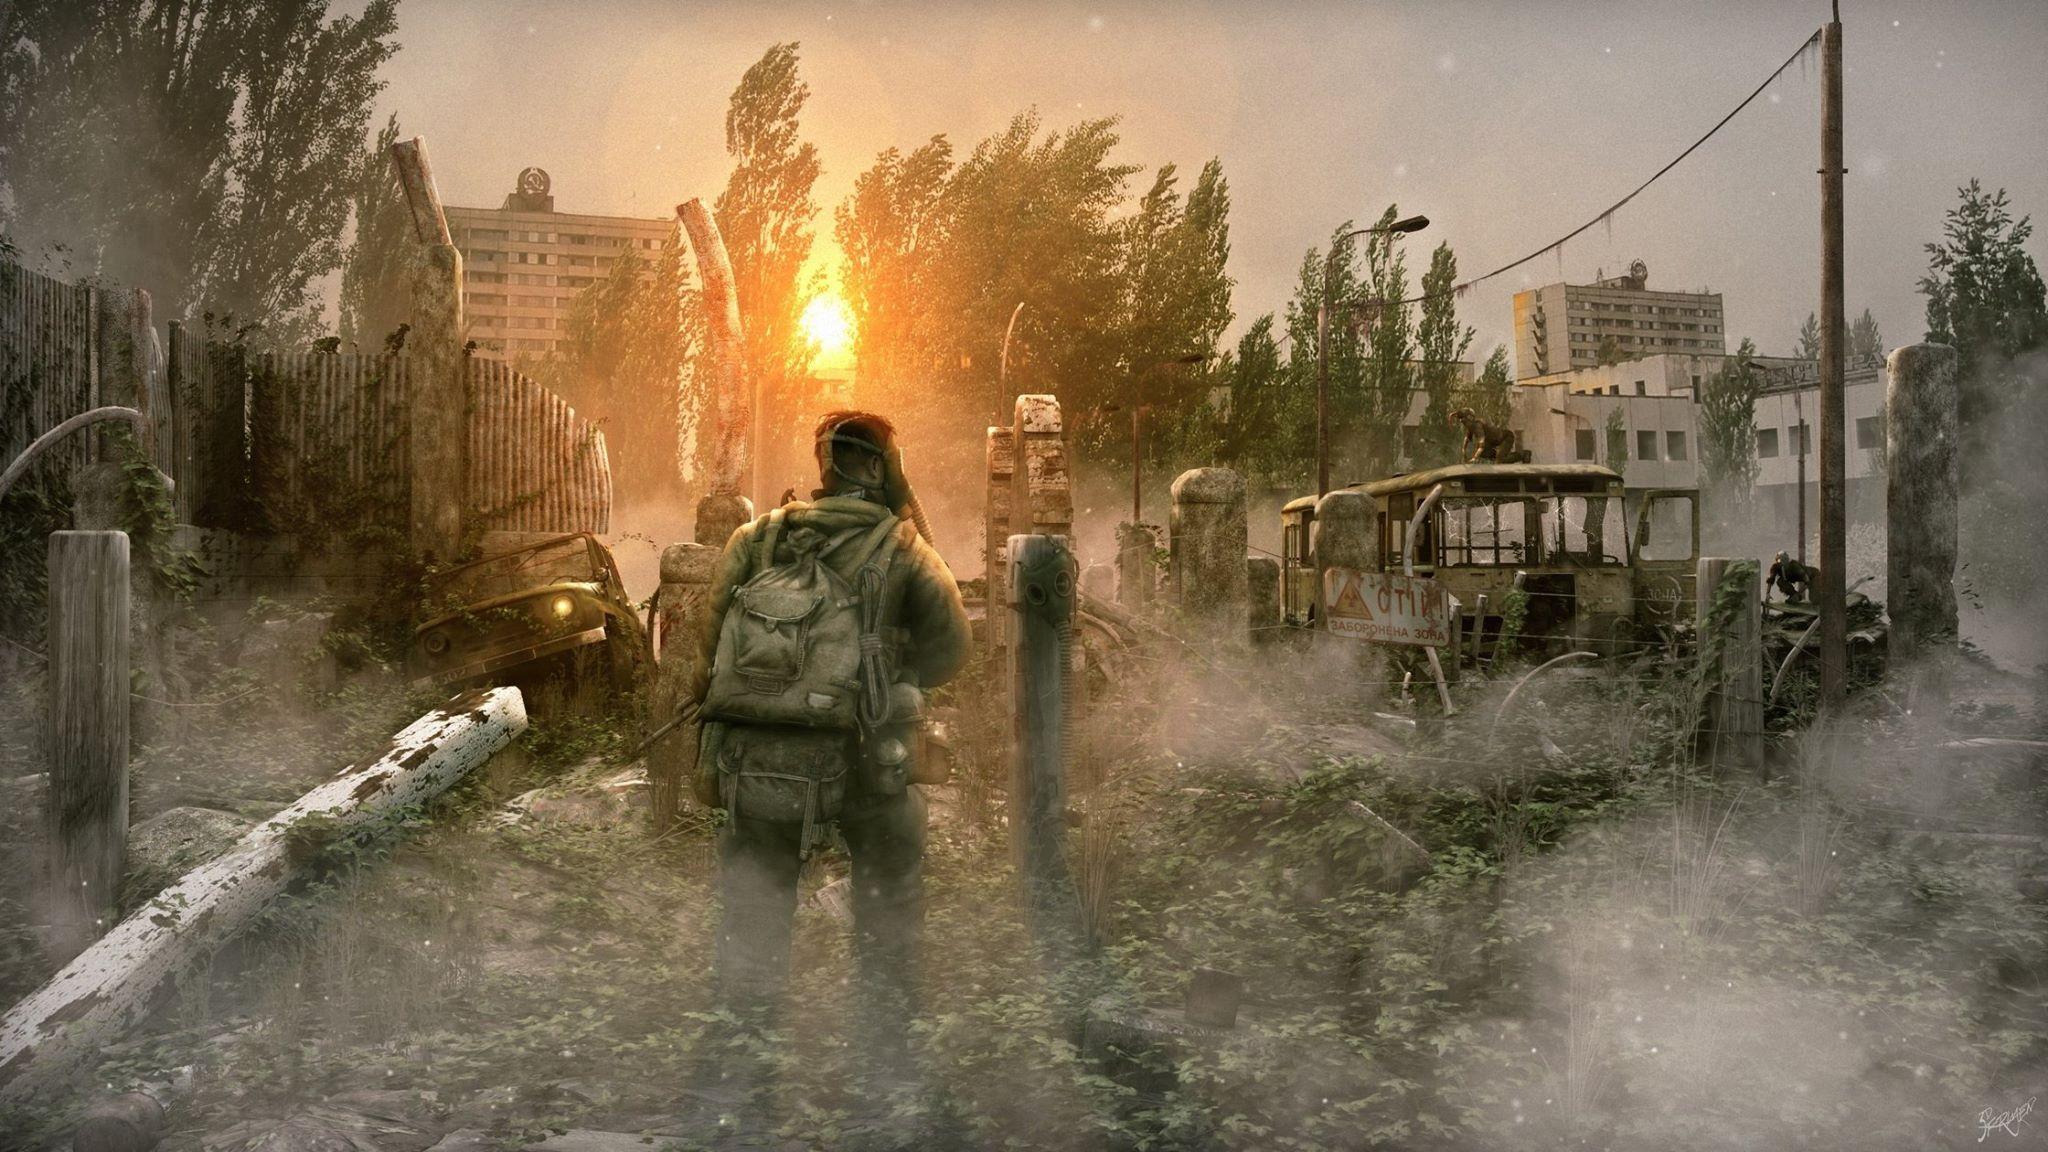 Retro Gamesy: S.T.A.L.K.E.R.: Call Of Pripyat 9804